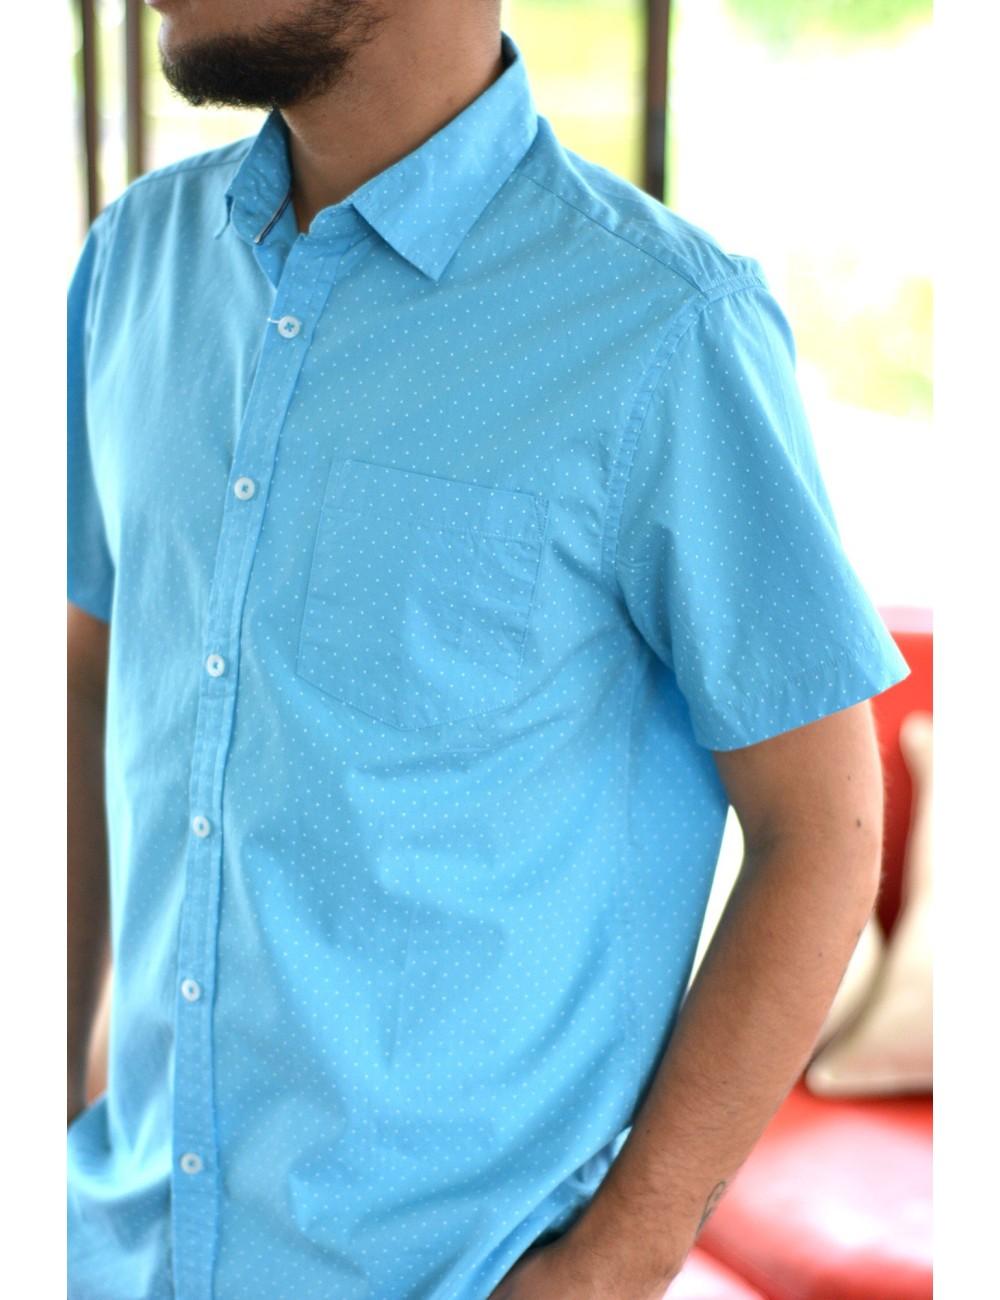 Camisa celeste manga corta puntos blancos